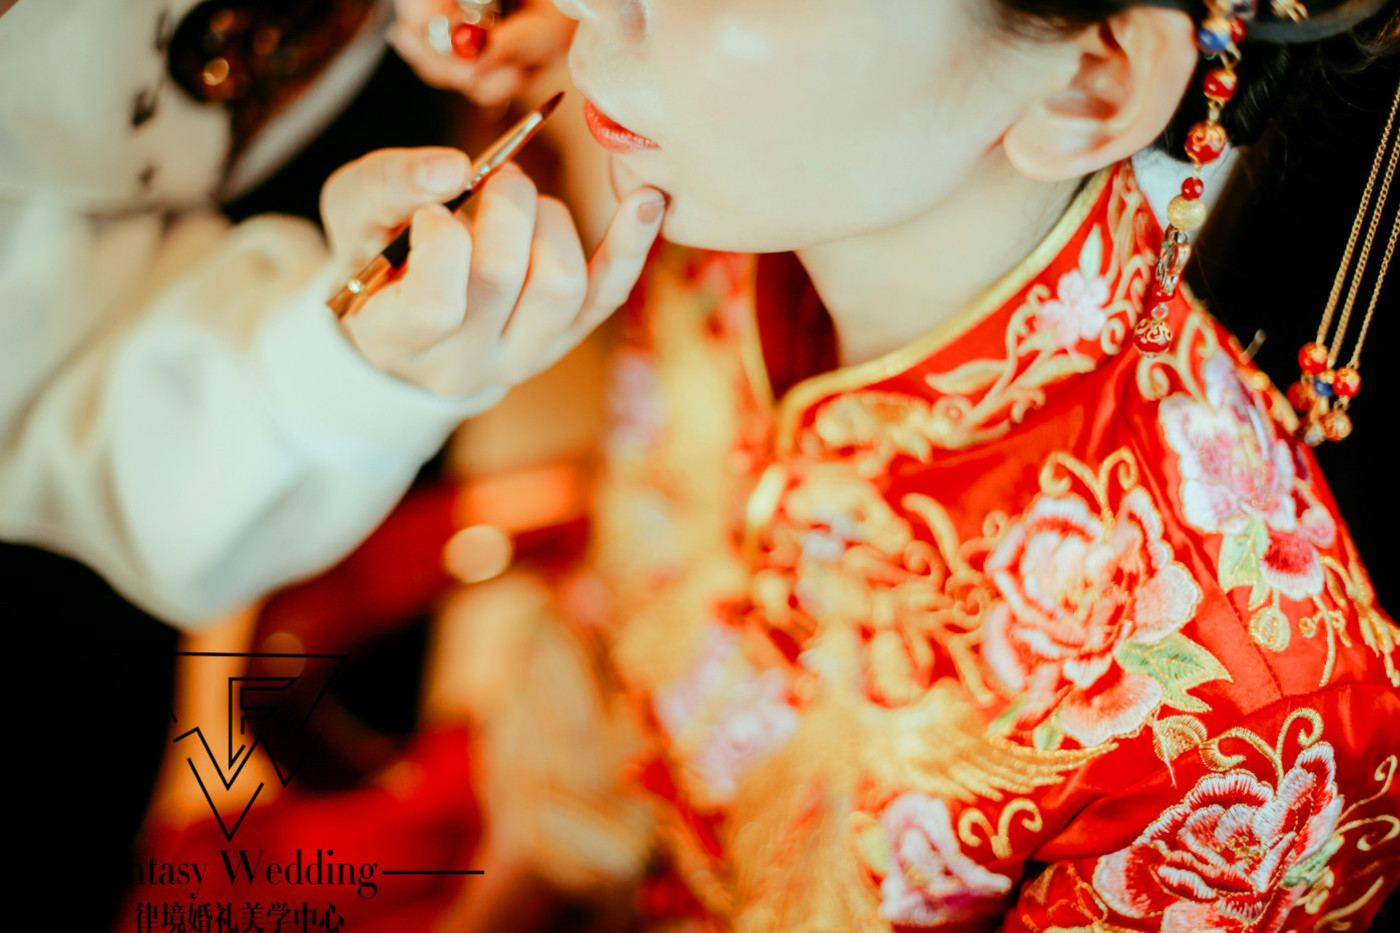 「Fantasy Wedding」& A/P 南艳湖5